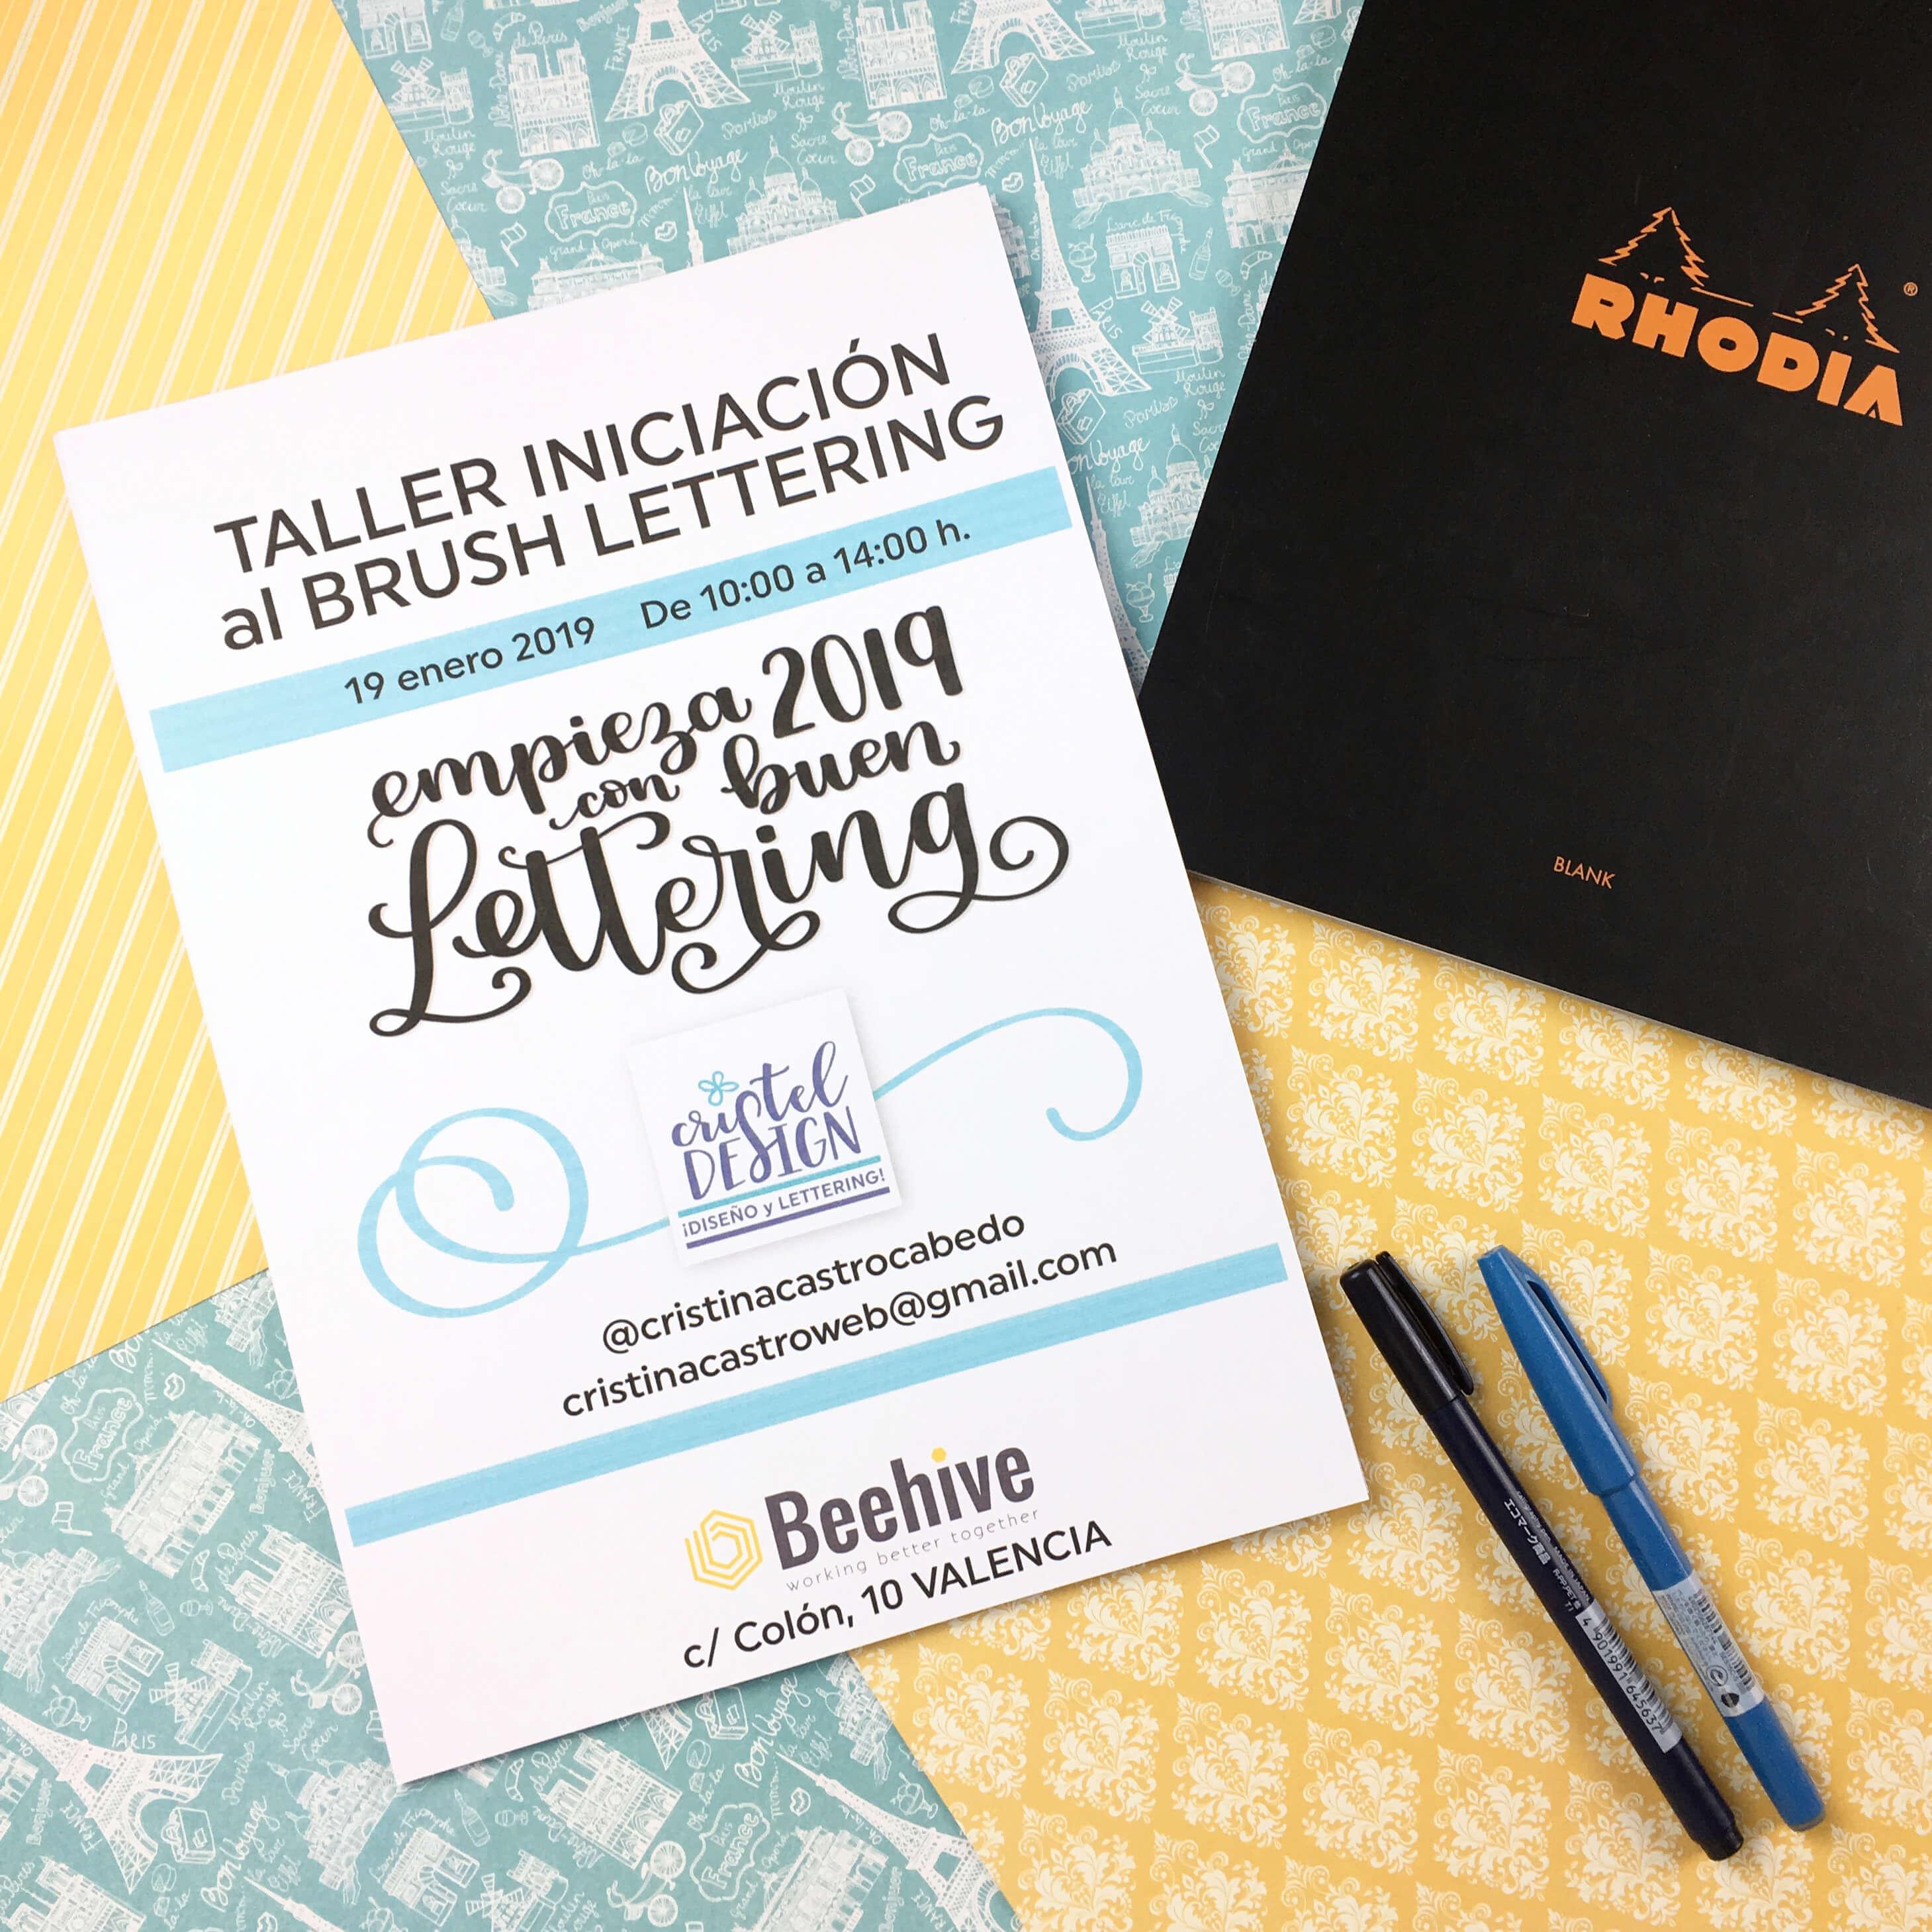 taller presencial brush lettering en Valencia - Cristel Design